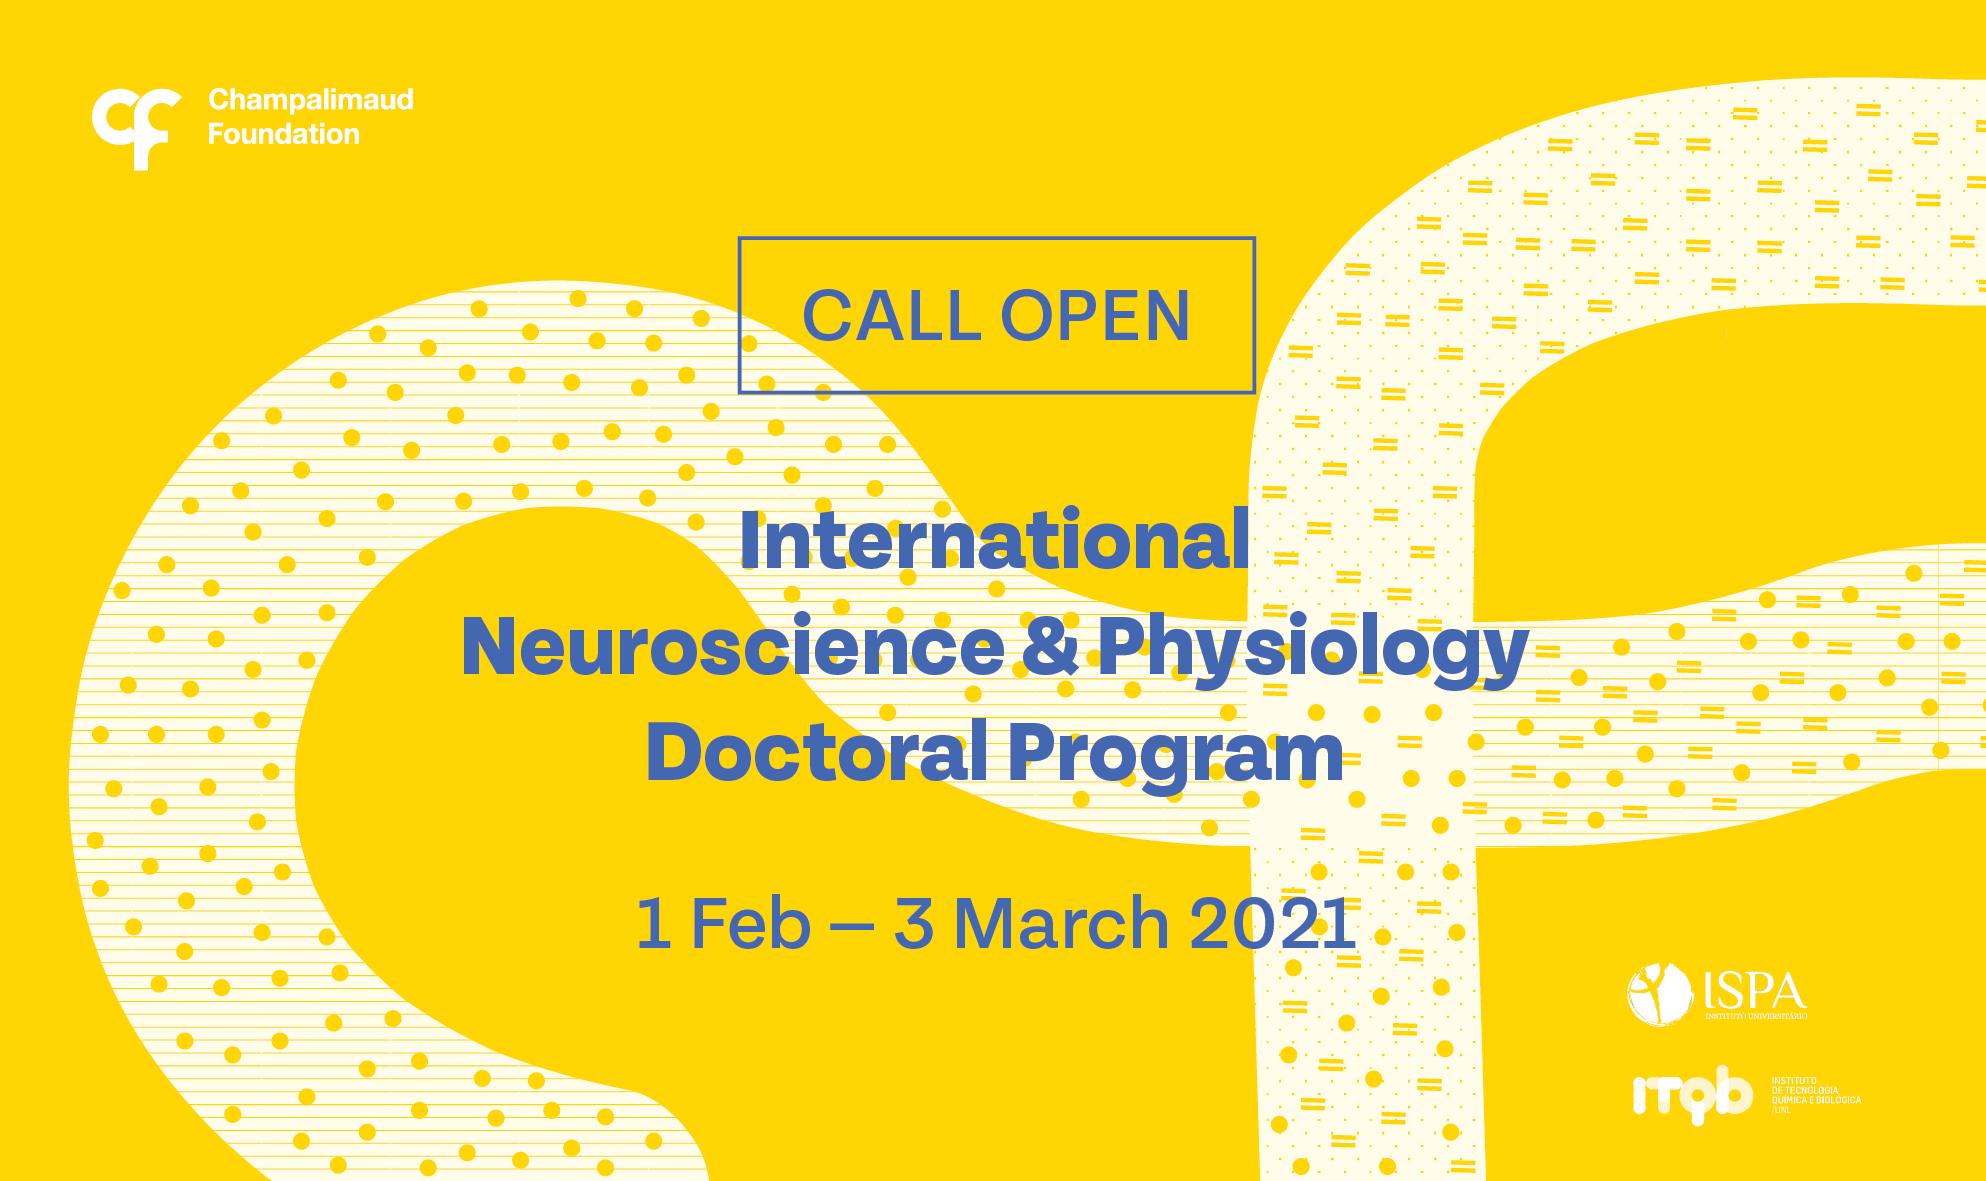 International Neuroscience & Physiology Doctoral Programme